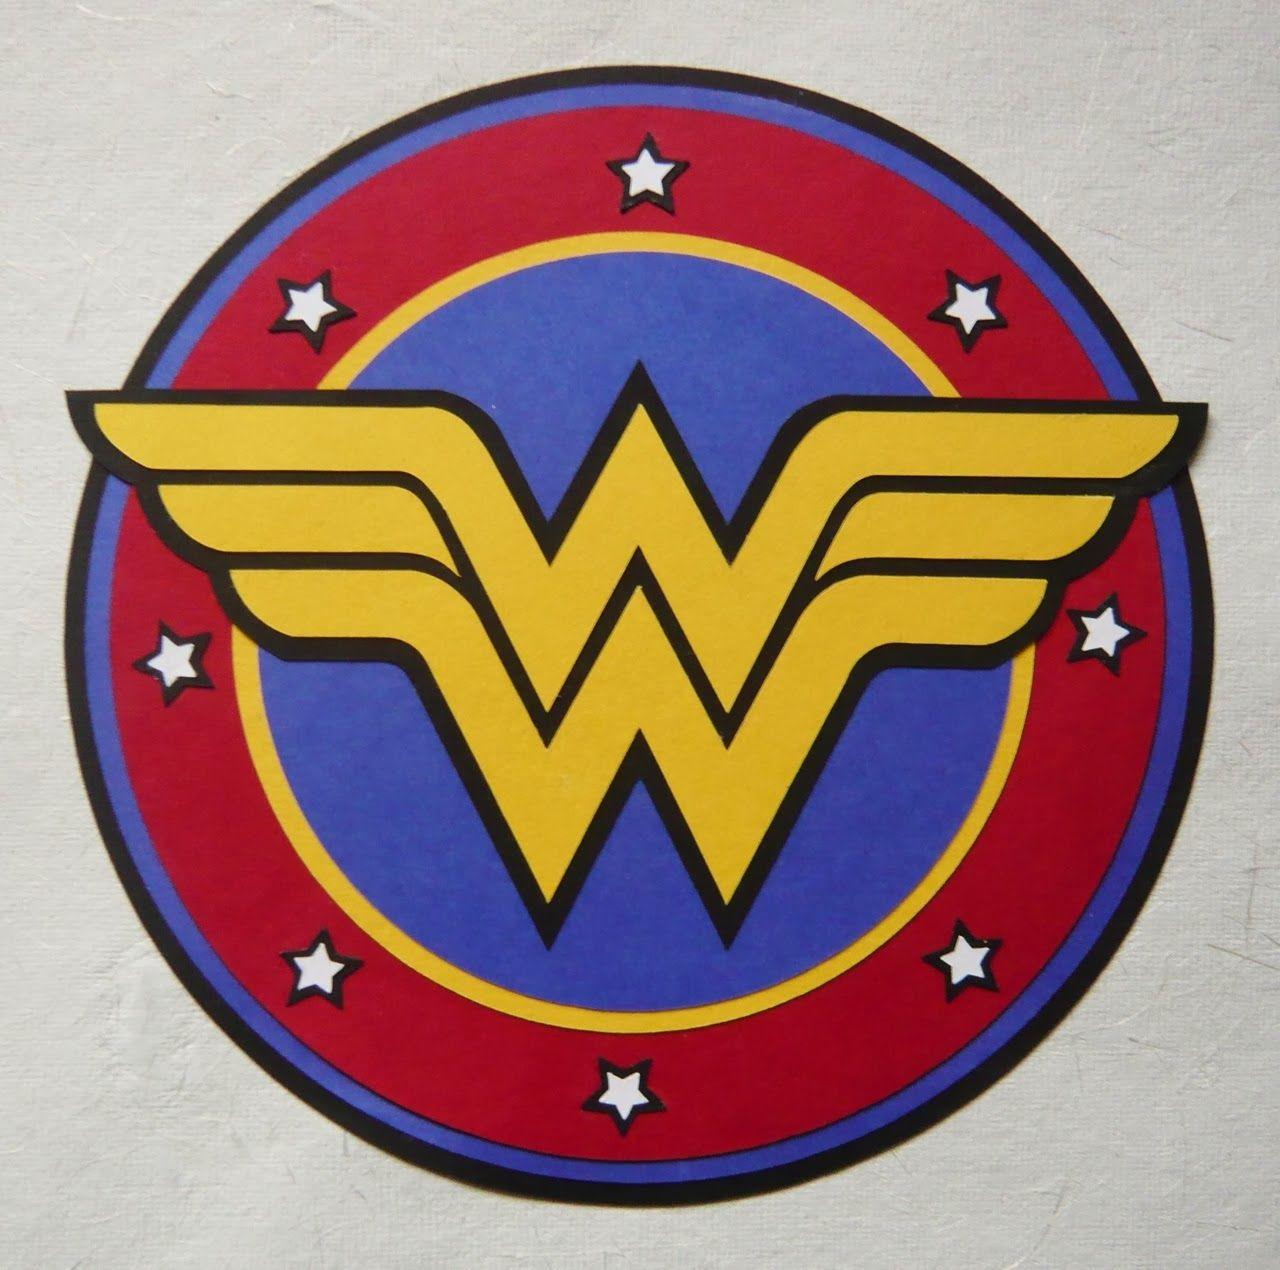 Símbolos de la Mujer Maravilla. | CUMPLE NACHO | Pinterest | La ...